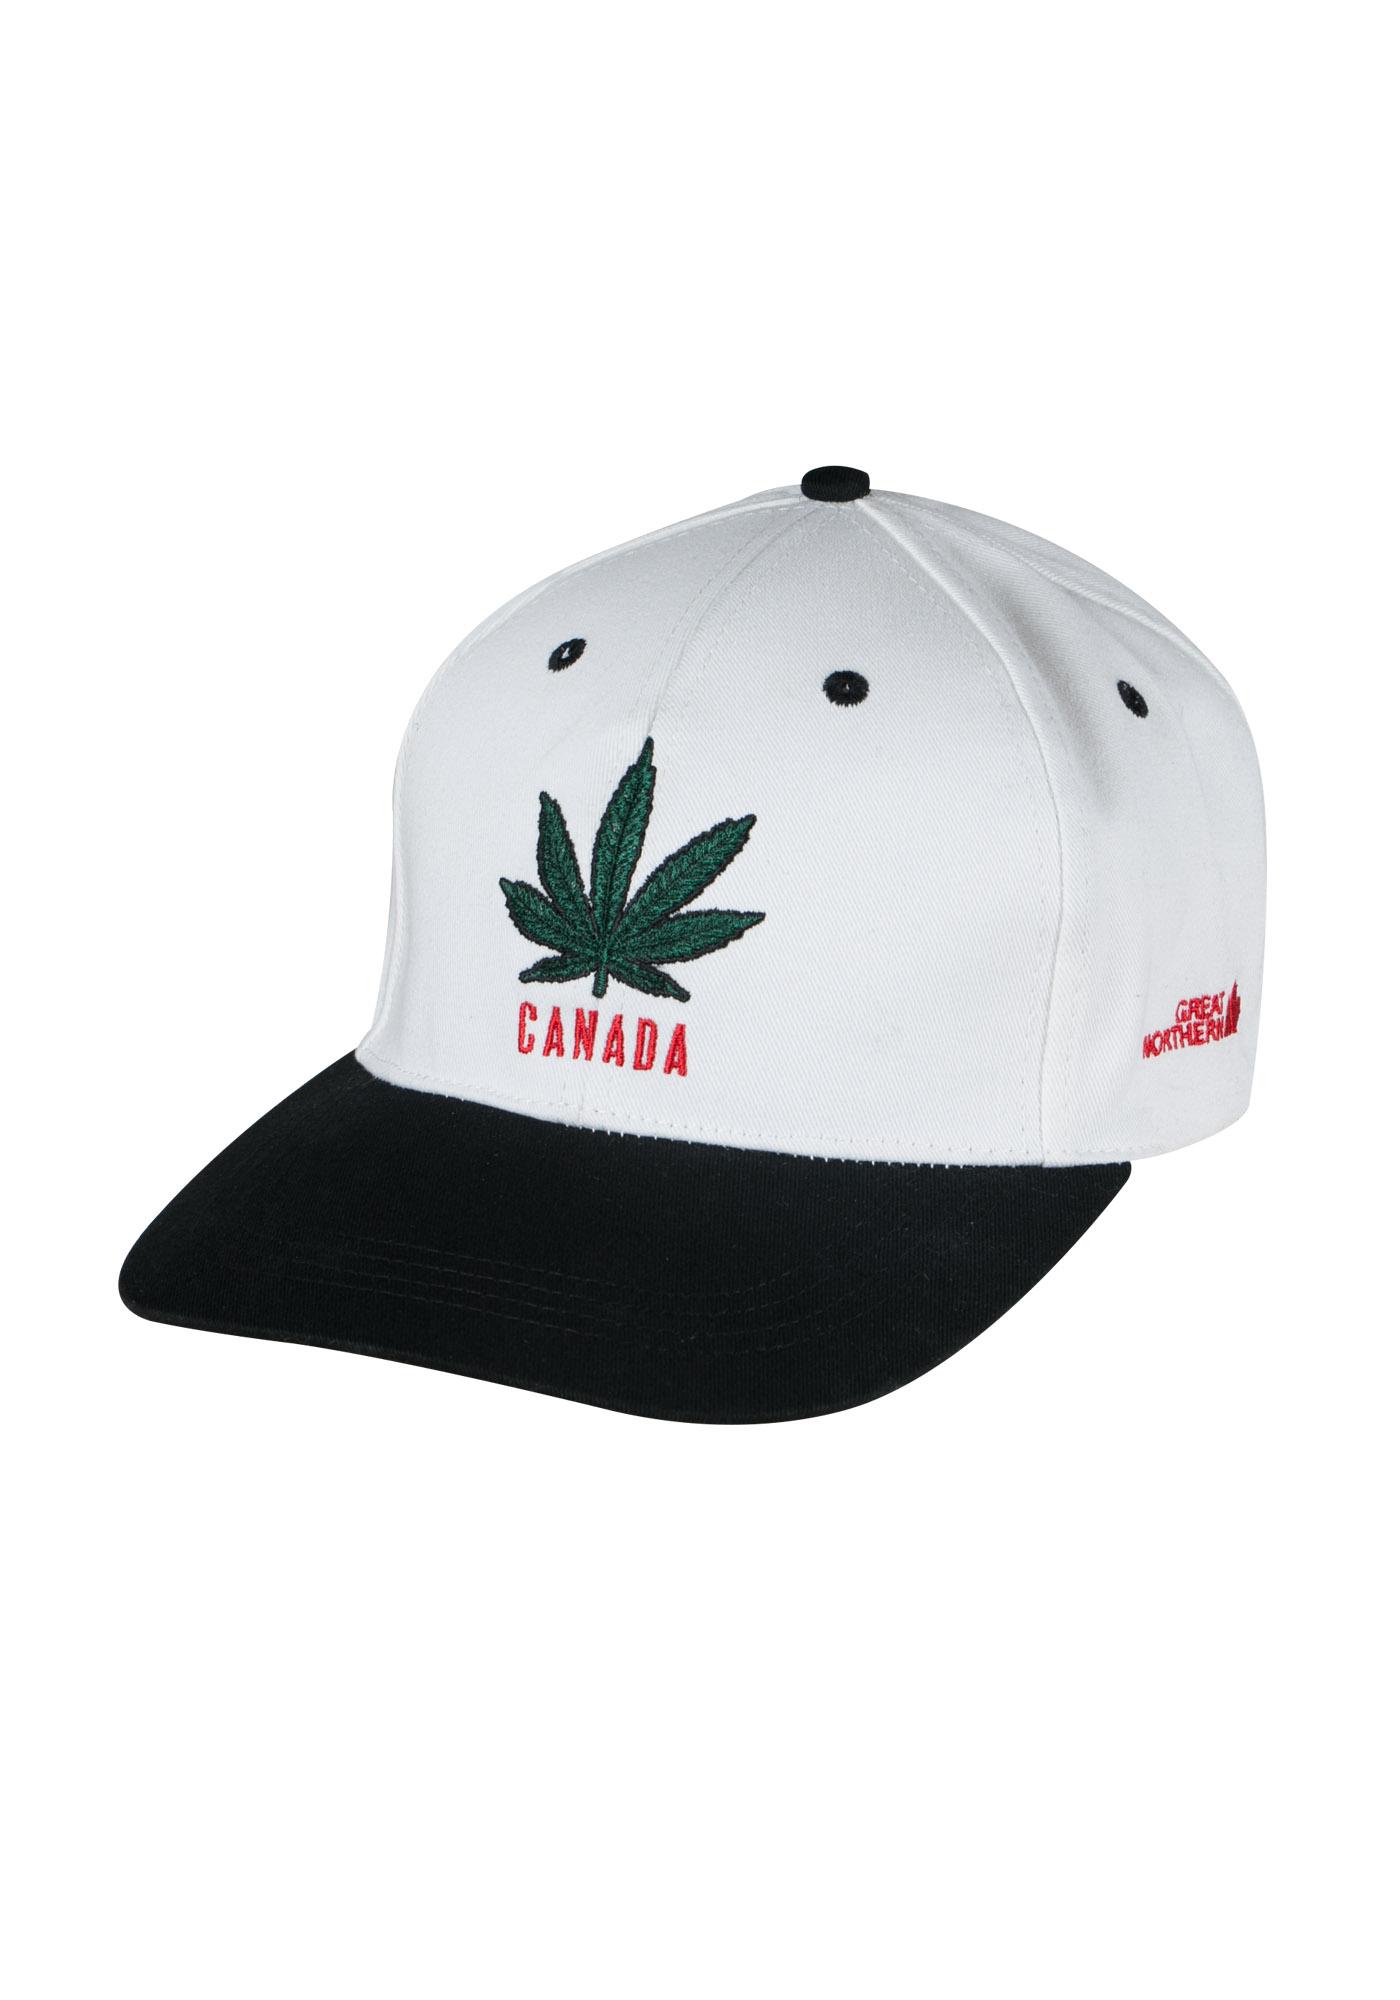 Flat Brim Hats Canada 69b20e6fa86